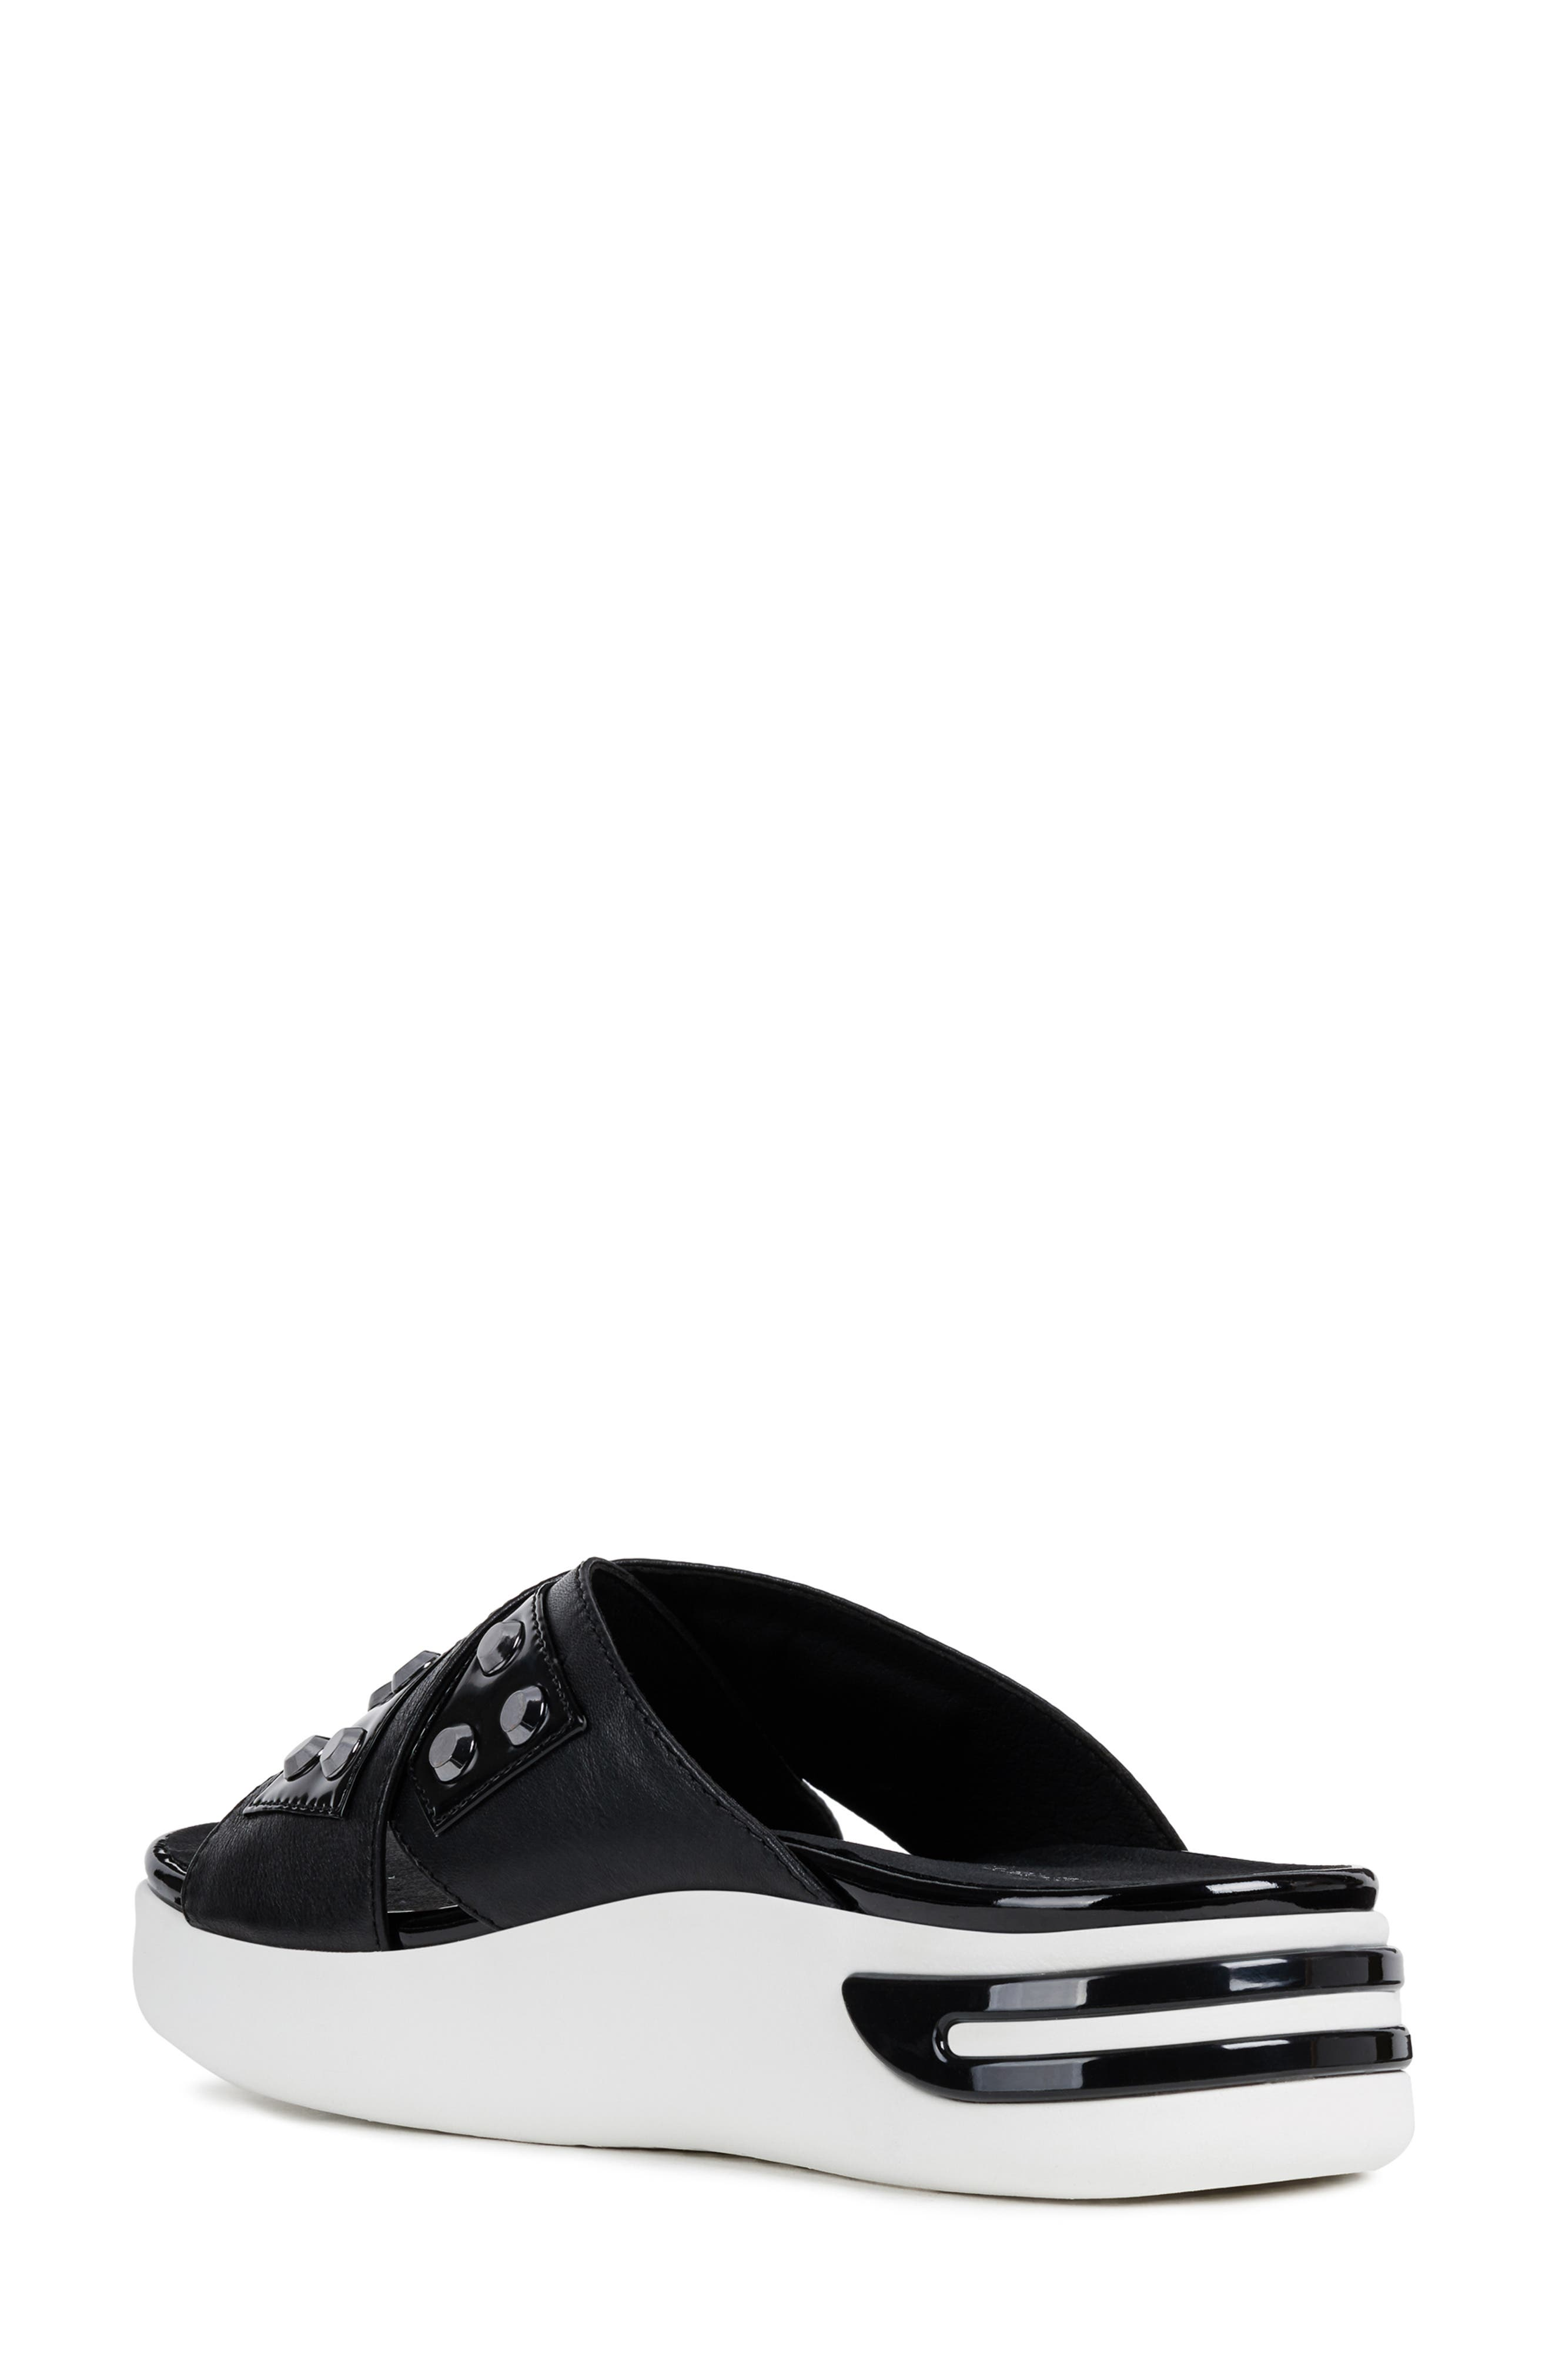 GEOX, Ottaya Studded Slide Sandal, Alternate thumbnail 2, color, BLACK LEATHER